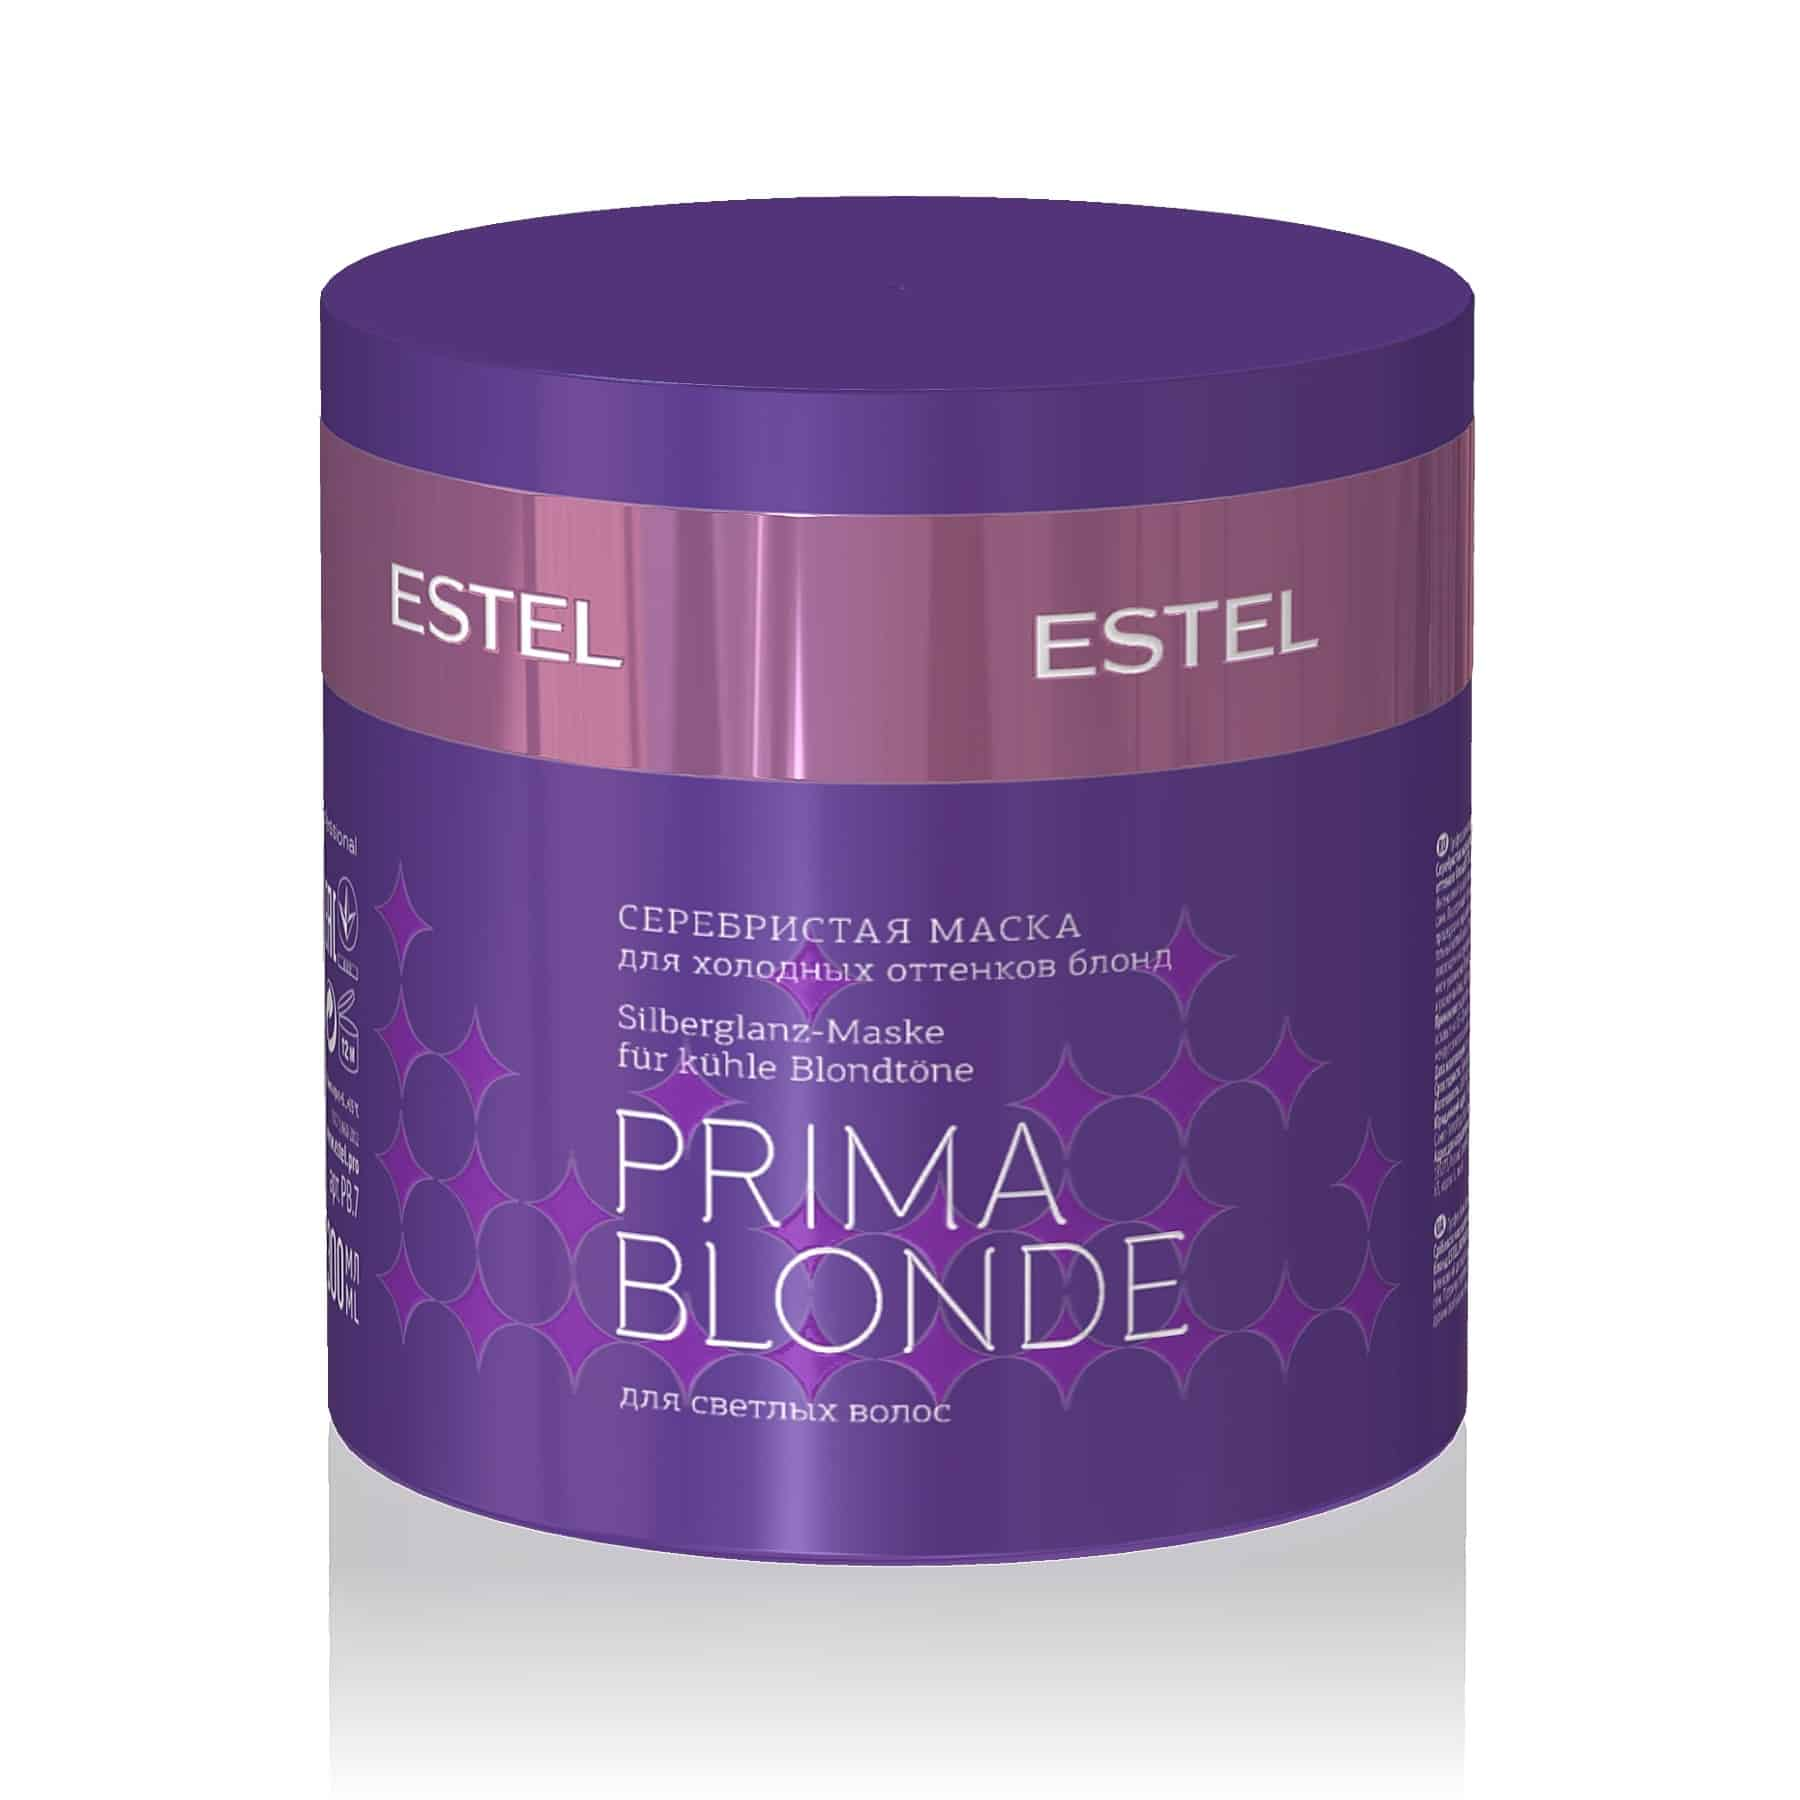 PRIMA-BLONDE-Silberglanz-Maske-für-kühle-Blondtöne